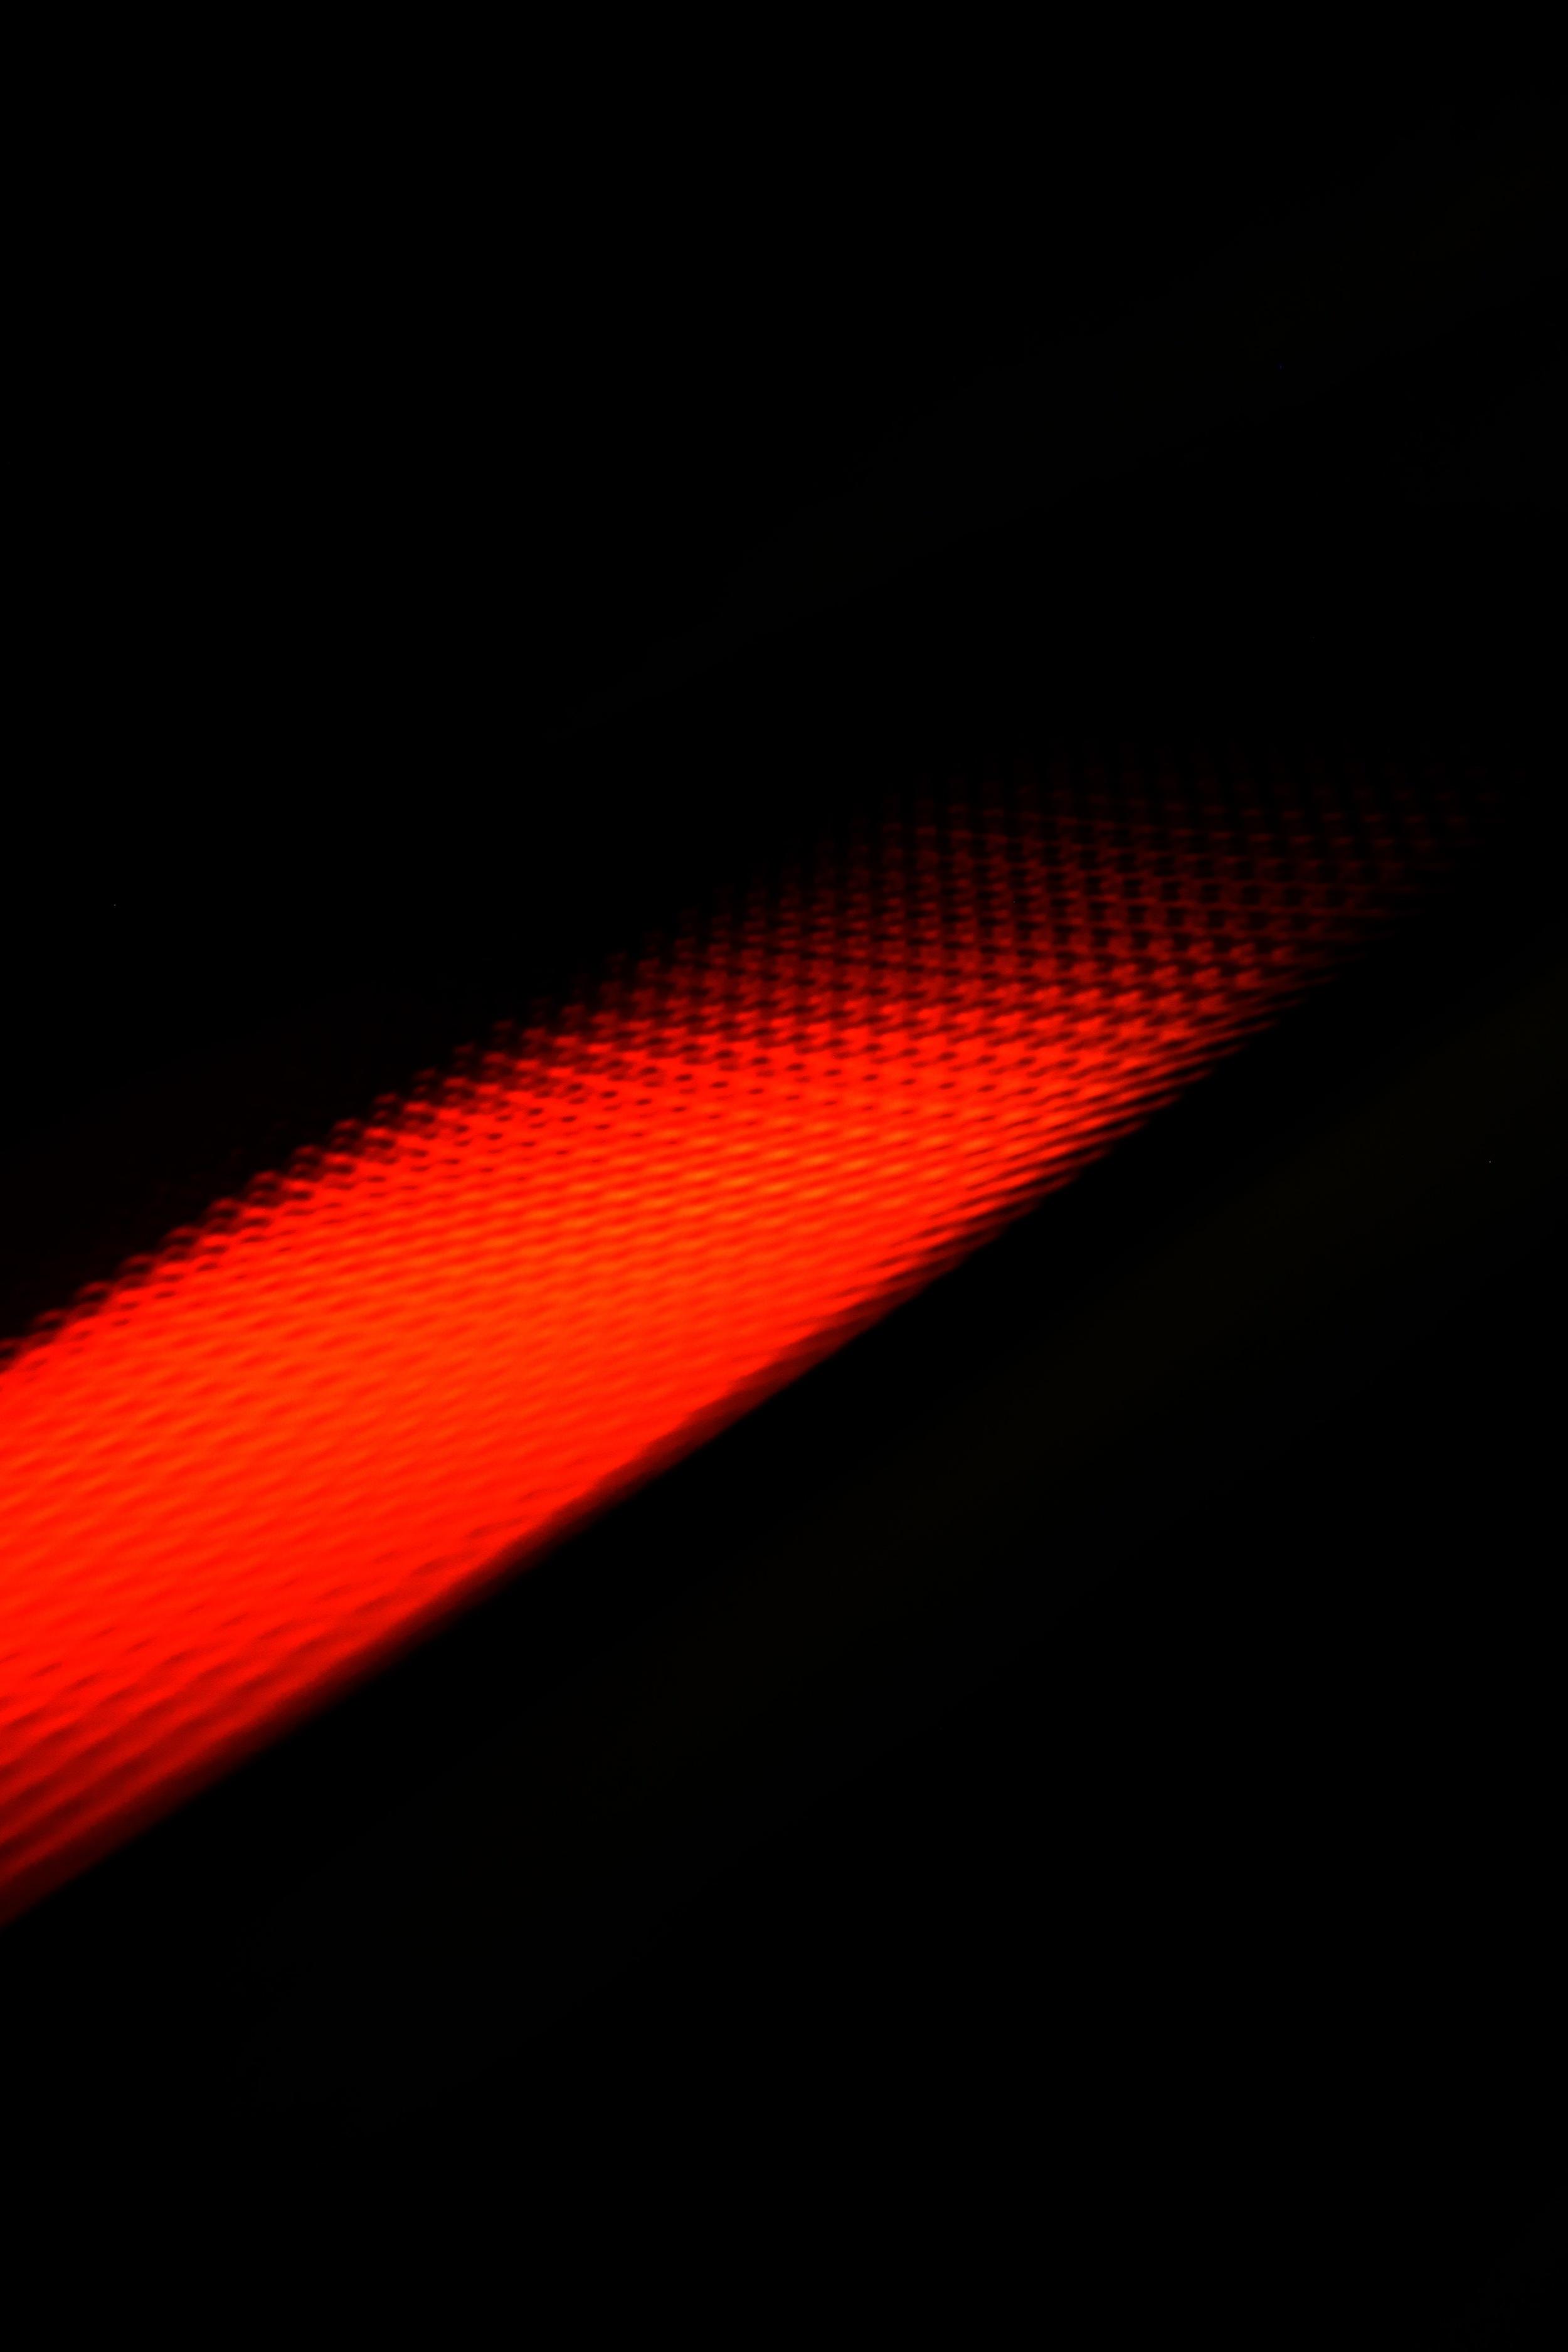 Motion_Blur_2.jpg